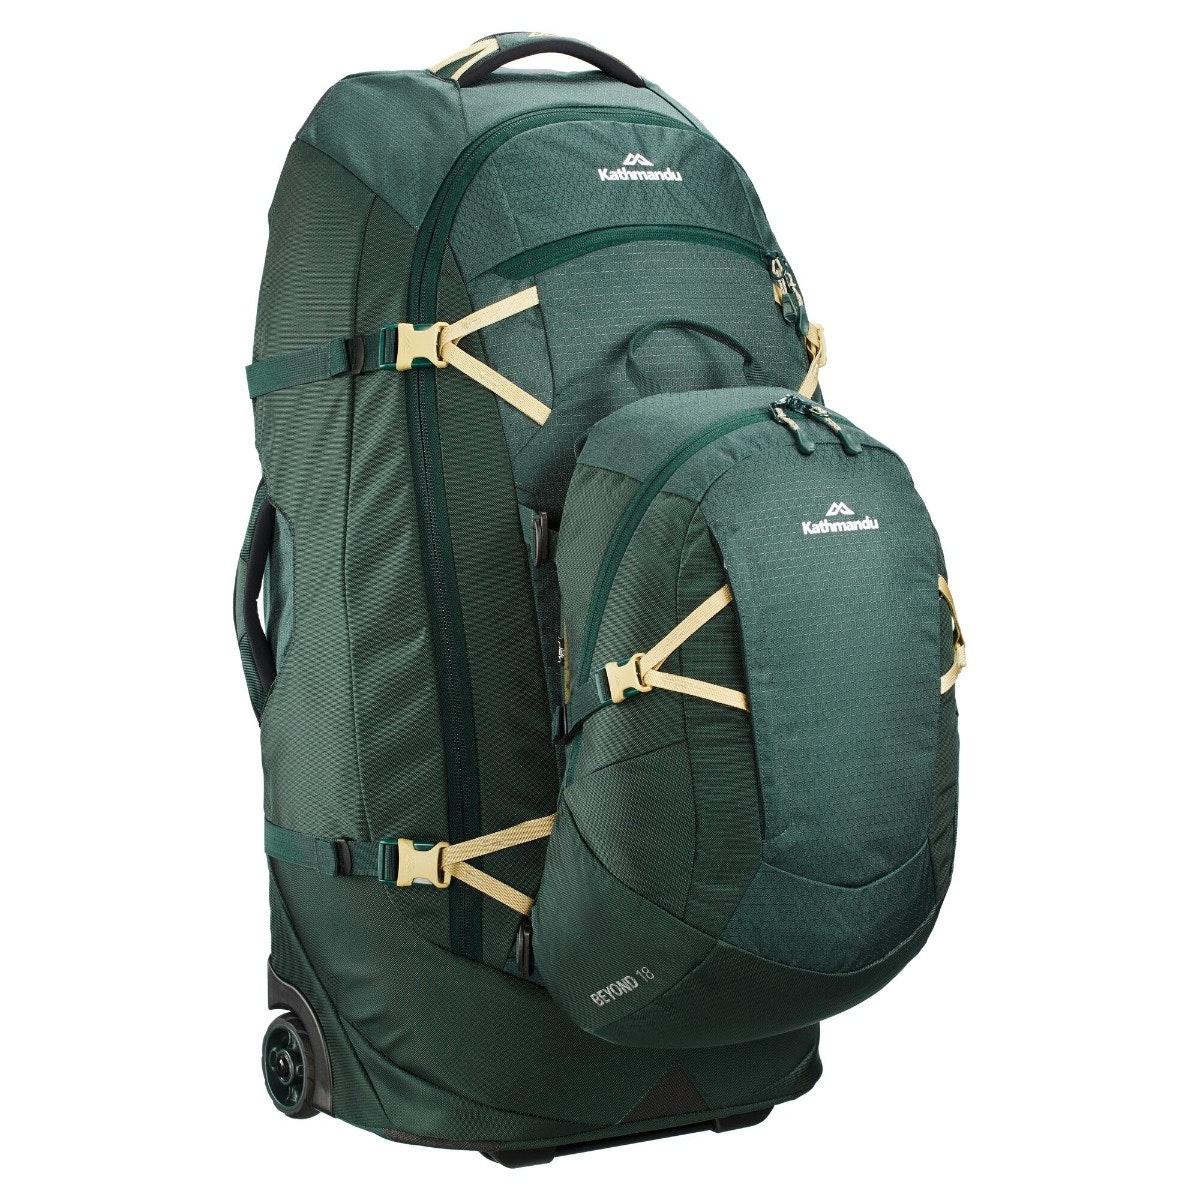 thumbnail 25 - NEW-Kathmandu-Hybrid-70L-Backpack-Wheeled-Handle-Luggage-Bag-Travel-Trolley